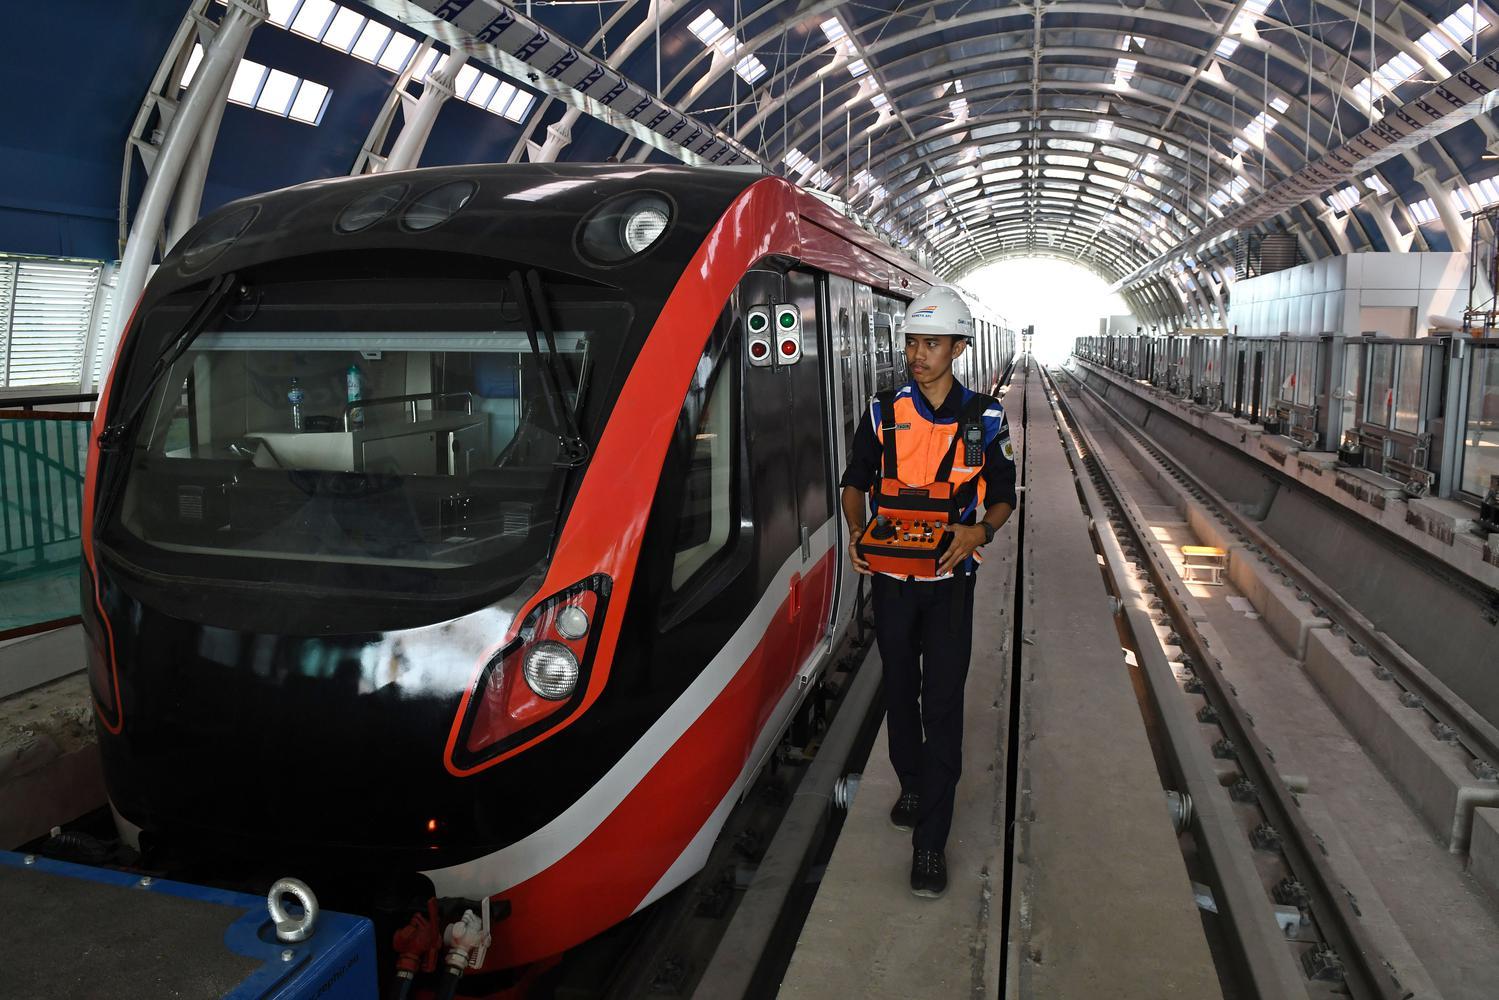 Petugas melintasi gerbong kereta 'light rail train' atau lintas rel terpadu (LRT) di Stasiun Harjamukti, Cimanggis, Kota Depok, Jawa Barat, Rabu (4/12/2019). LRT Jabodebek koridor Cibubur-Dukuh Atas mempunyai kapasitas sebanyak 250 orang per gerbong